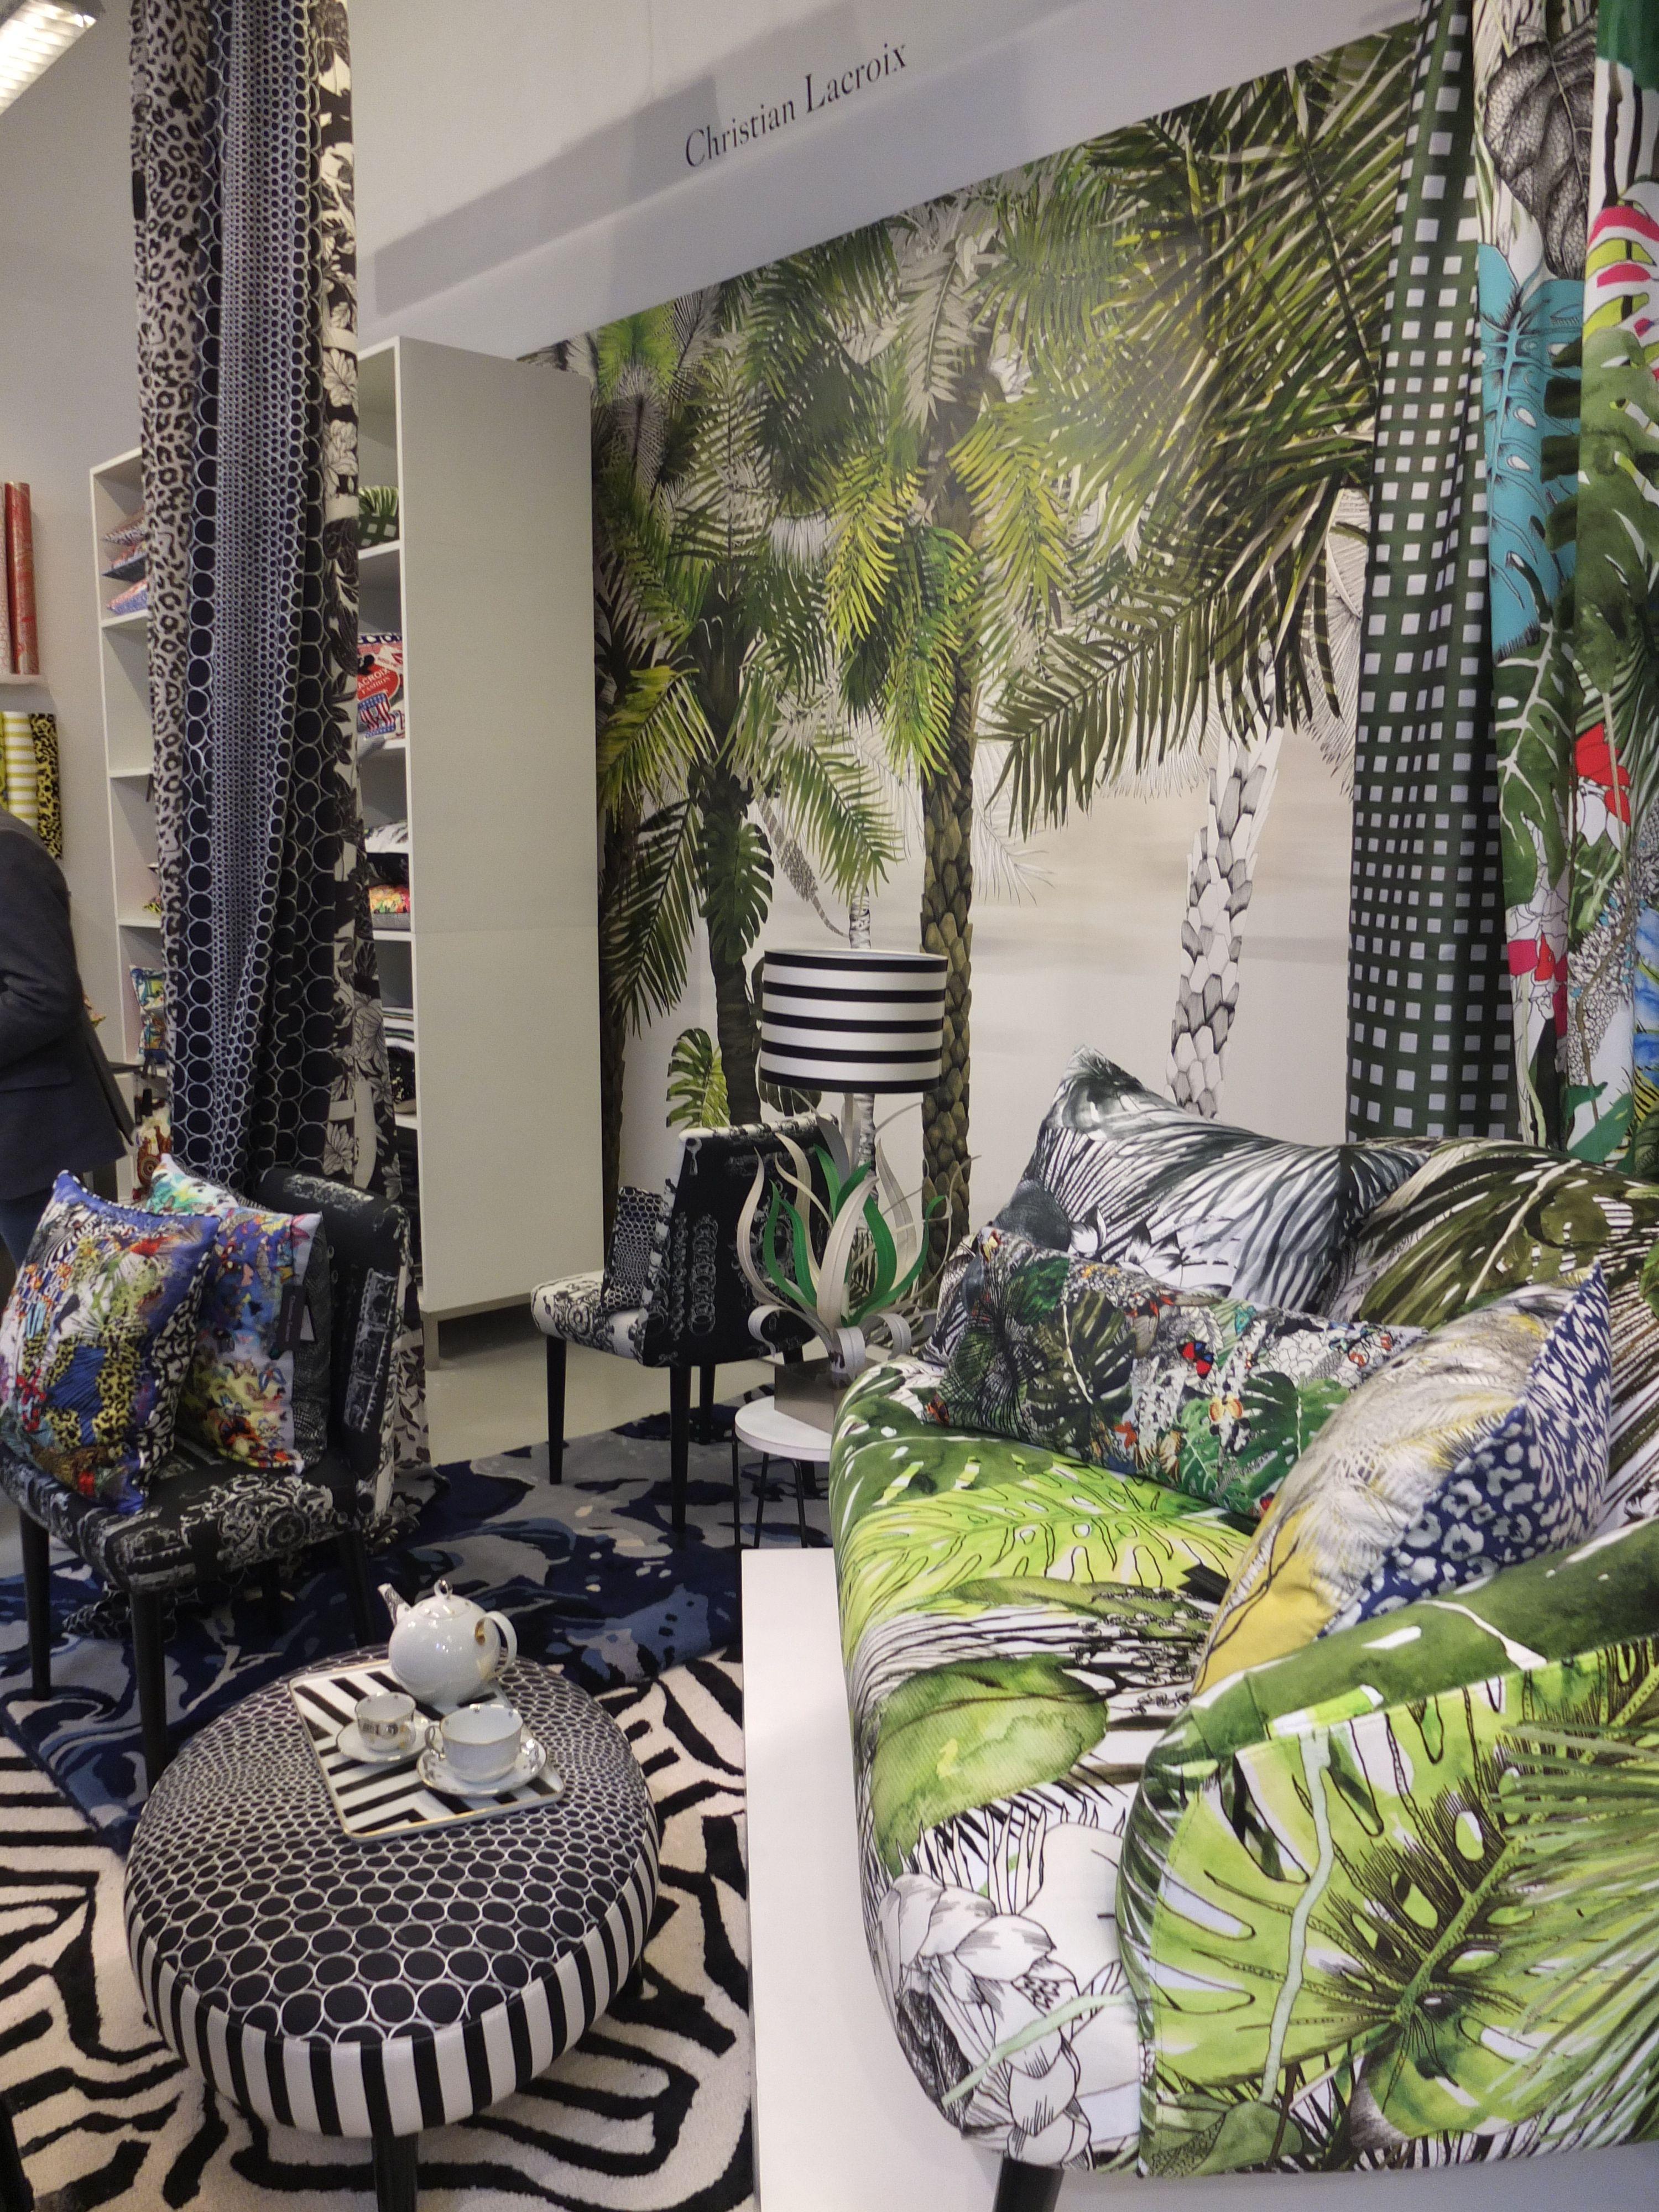 show room designers guild paris d co off 14 for the. Black Bedroom Furniture Sets. Home Design Ideas